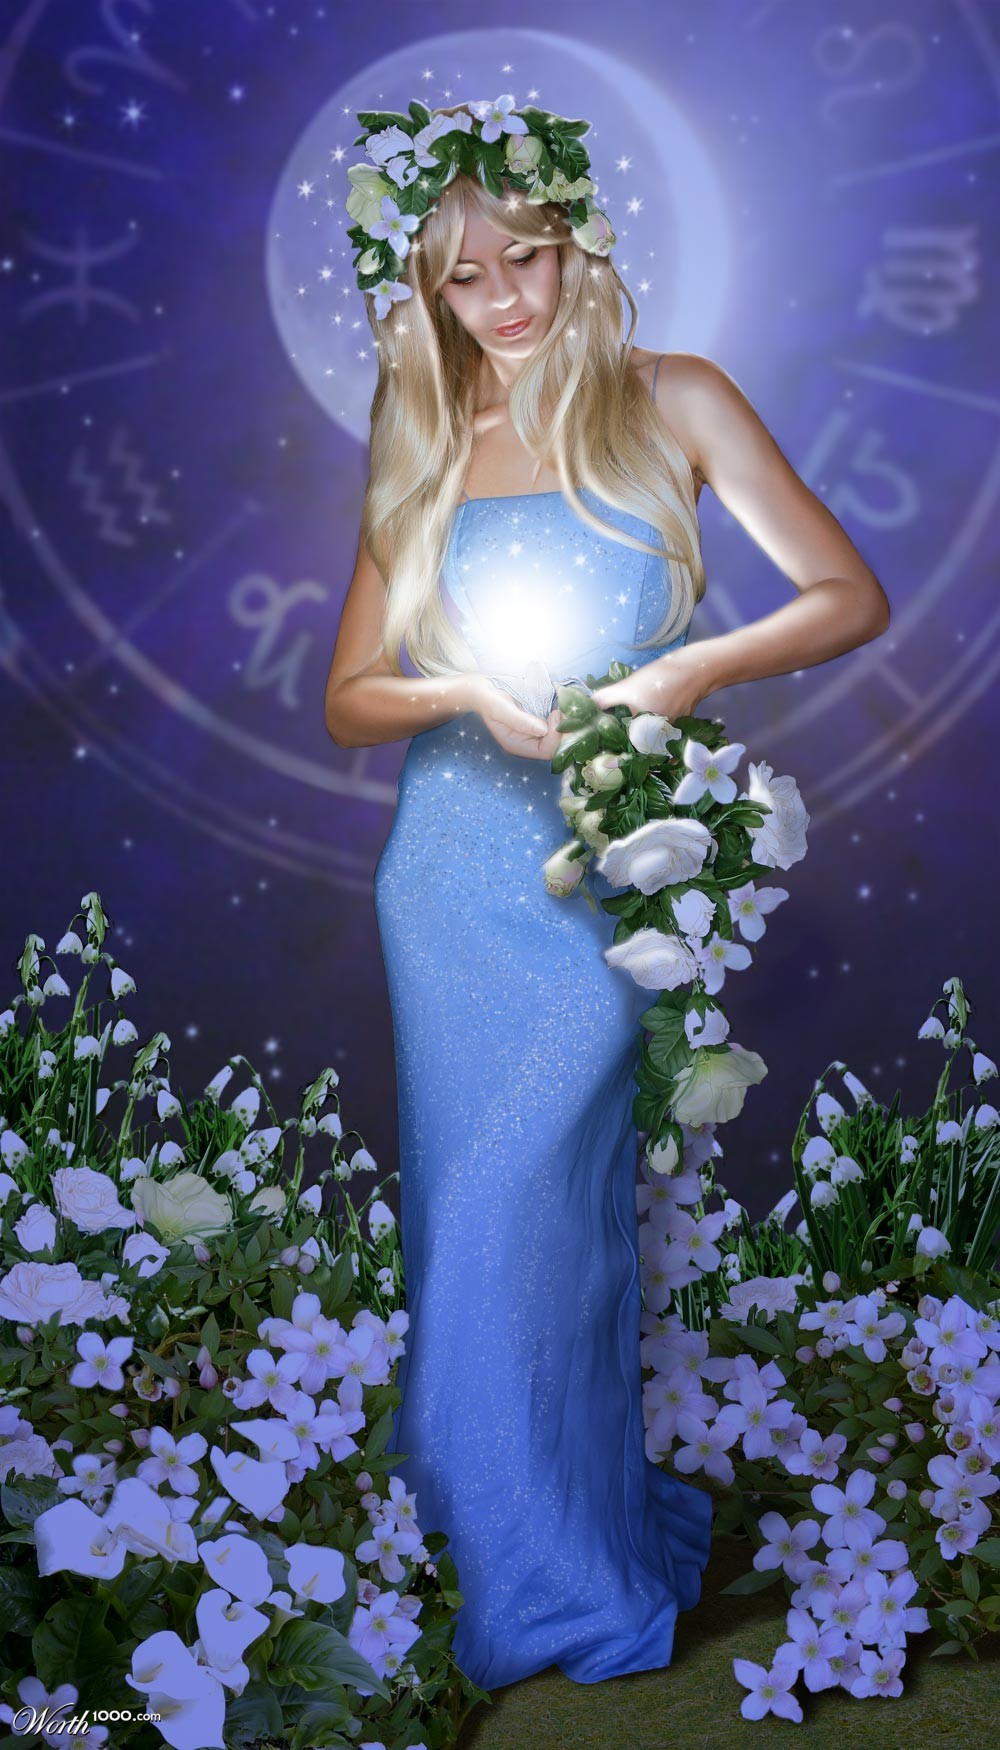 The Virgo Comes Home to Heal the Divine Feminine  ~ Melissa